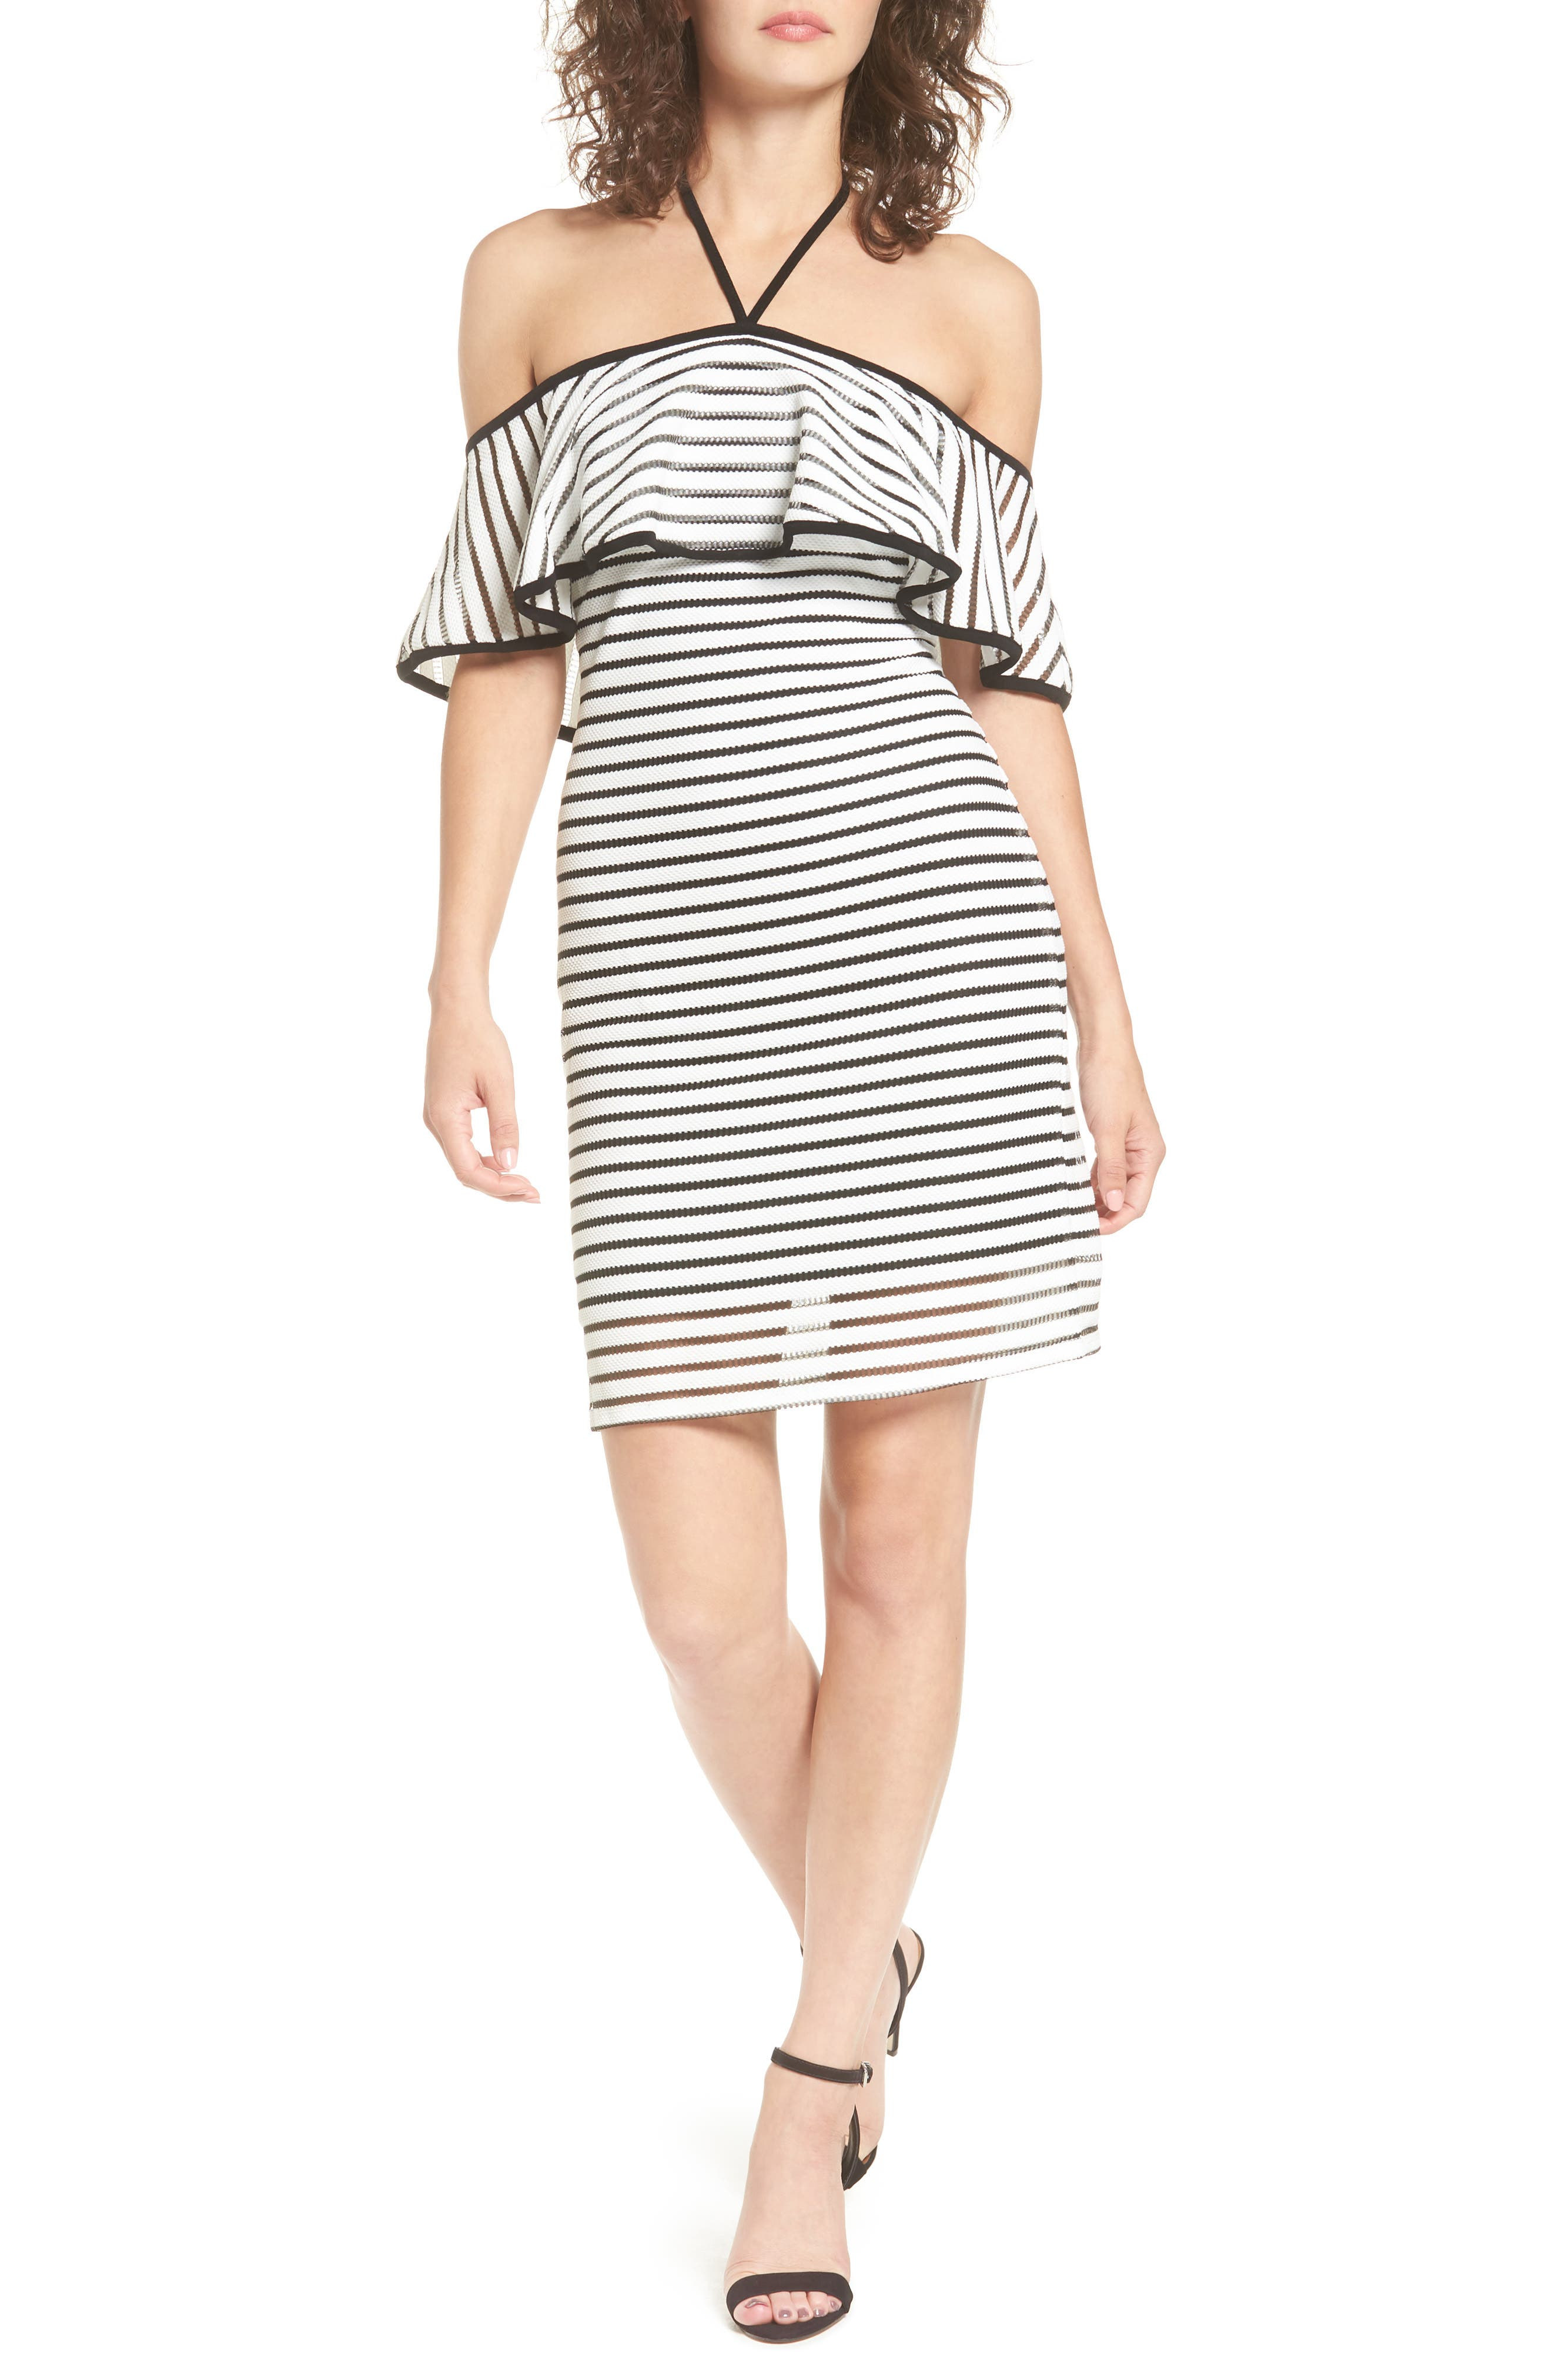 AS U WISH As You Wish Ruffle Popover Stripe Body-Con Dress